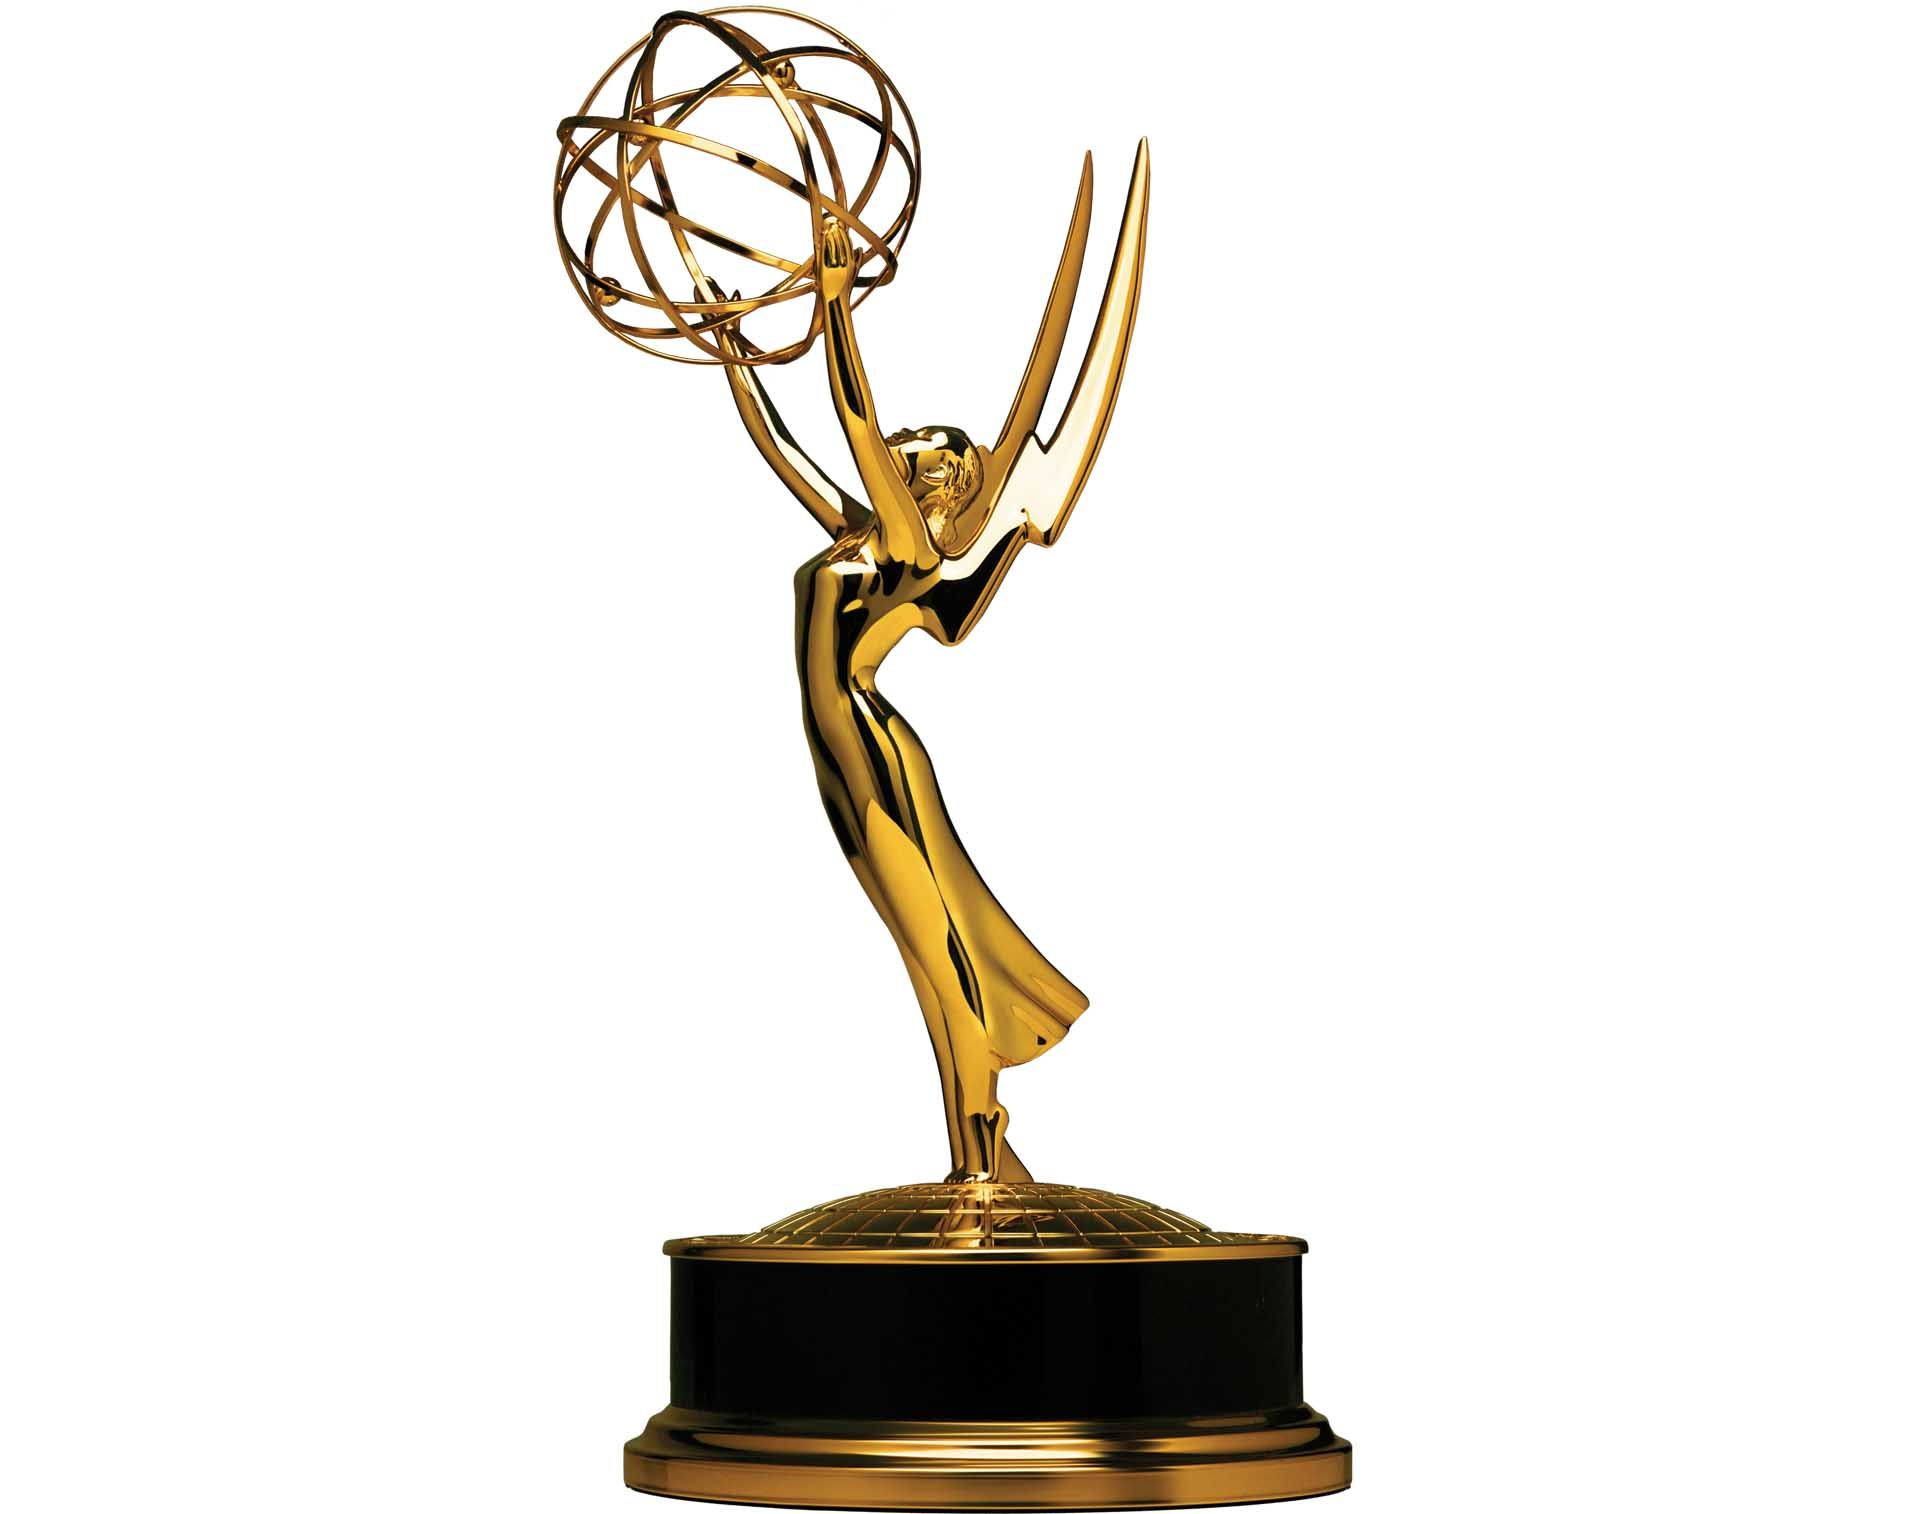 Pré-cadastro Emmy / RioFilme & ABPITV